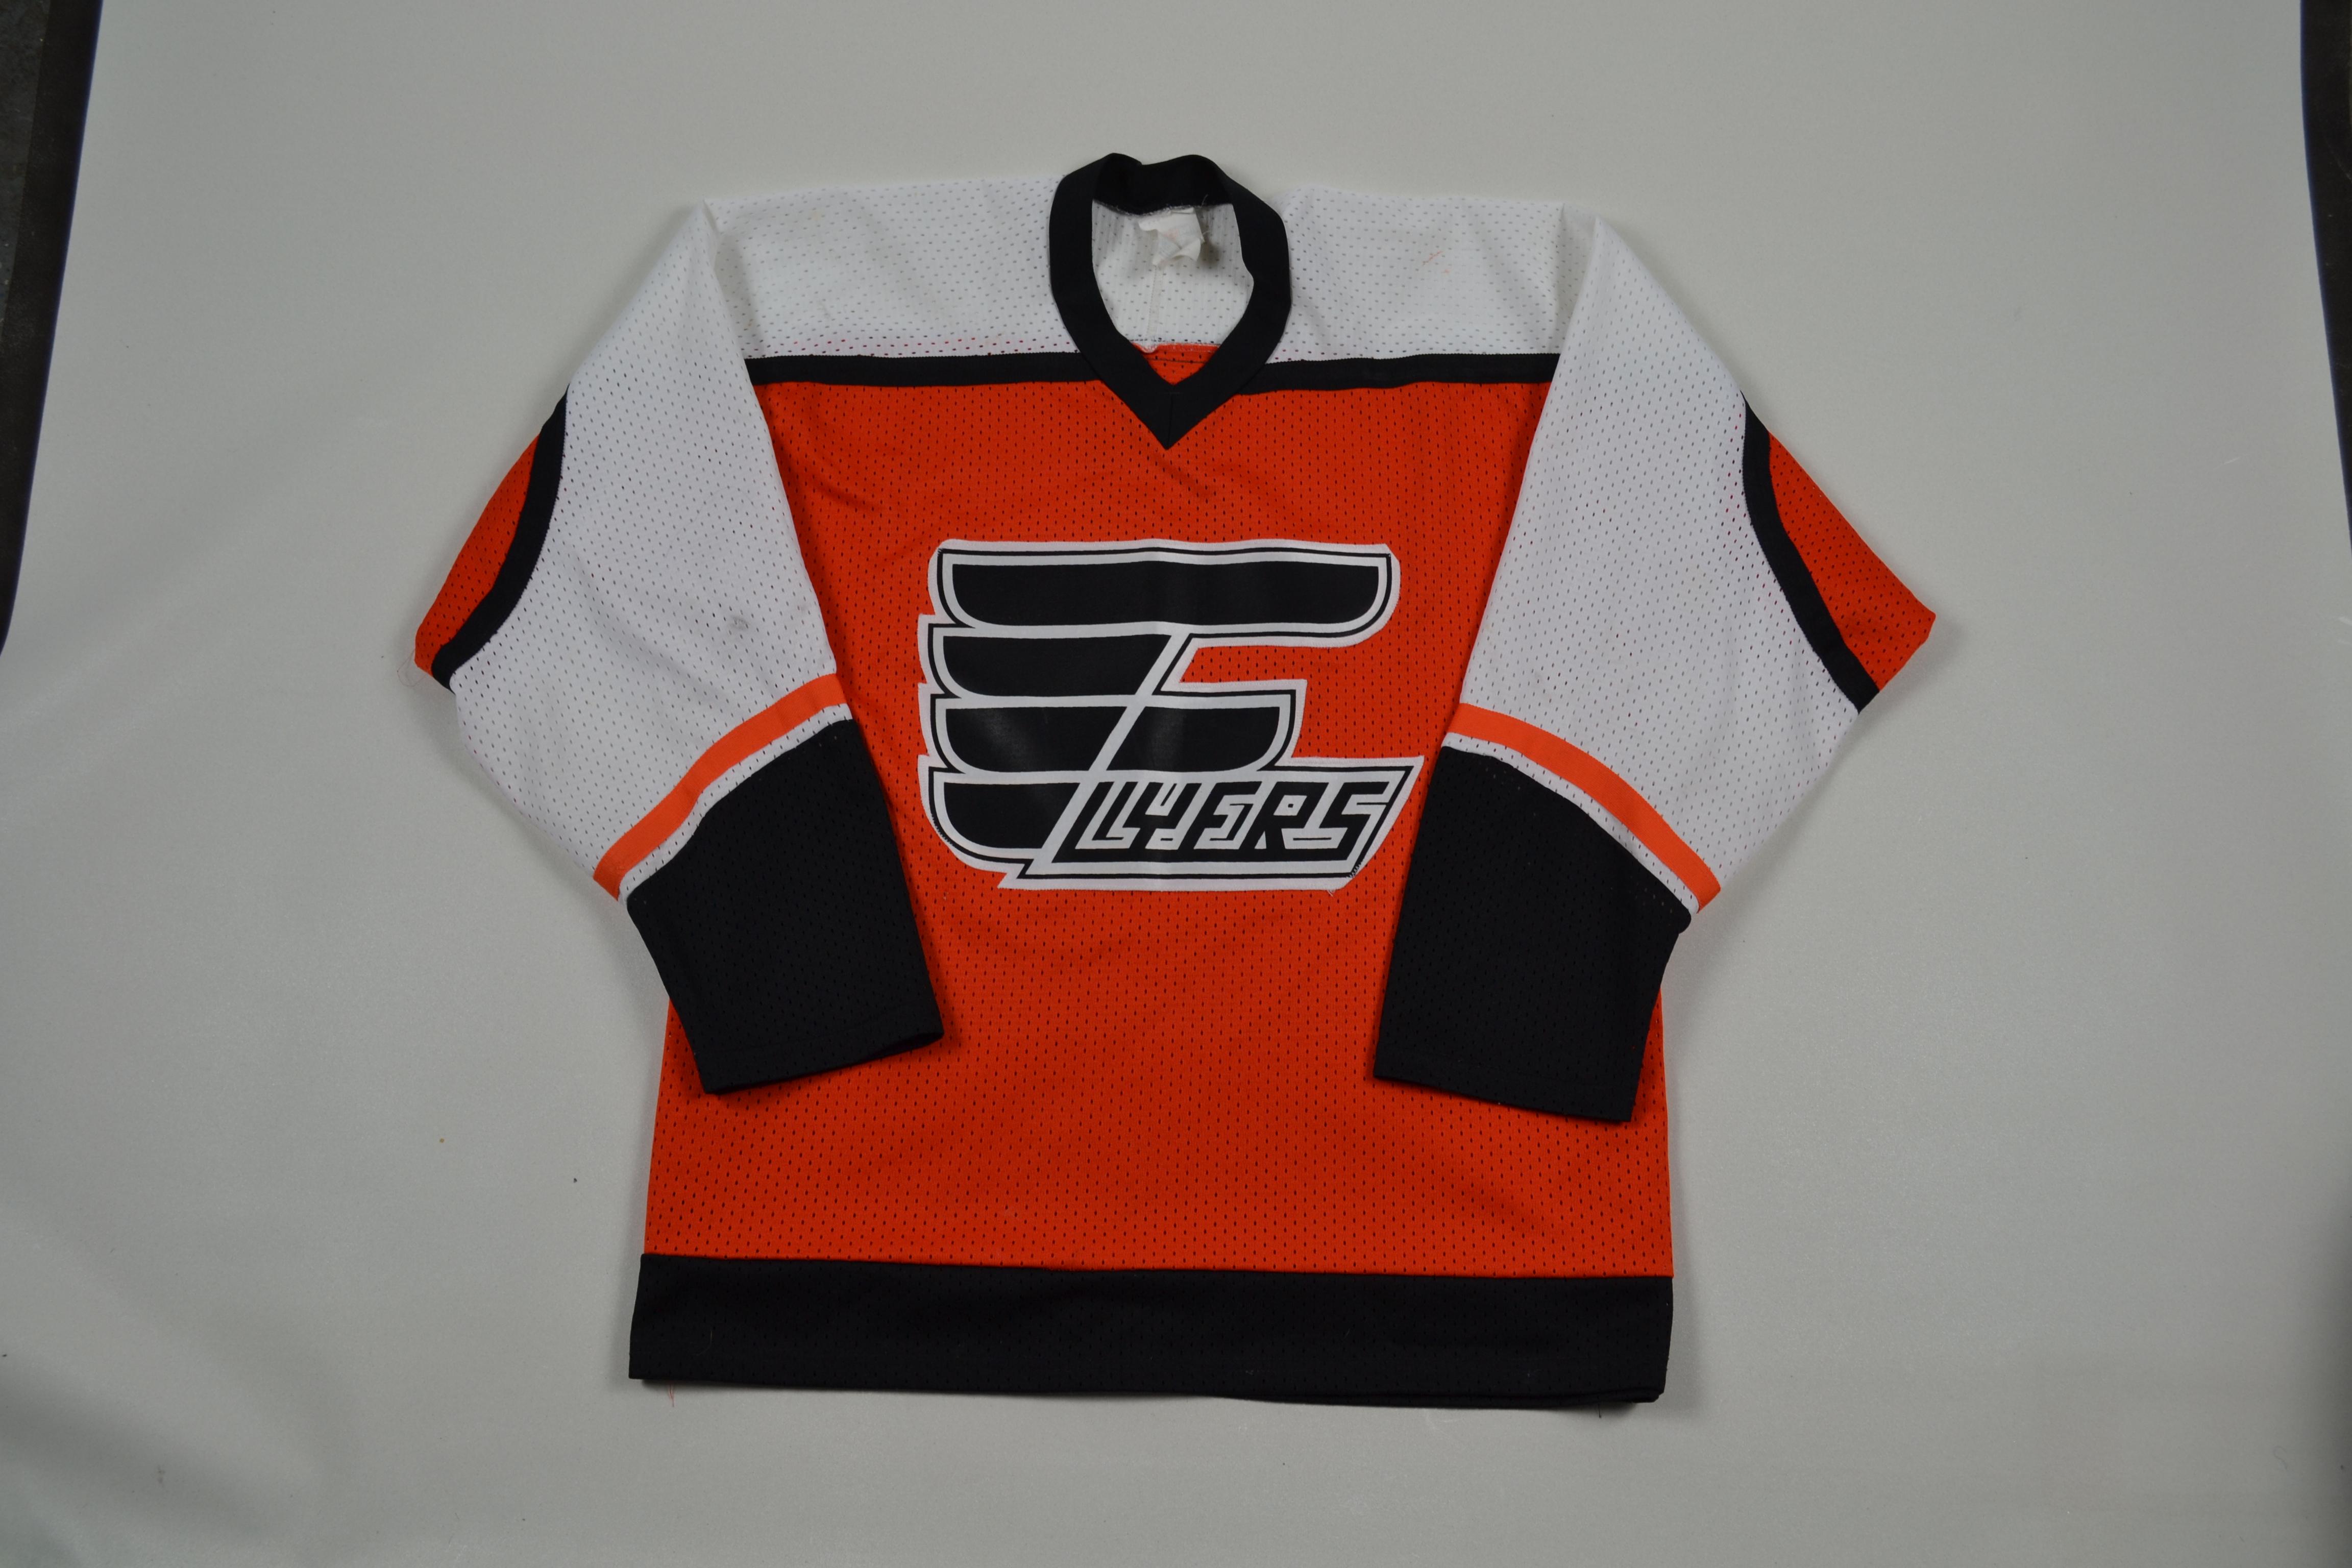 1a0a8eaf4 Ccm VTG CCM PF Flyers Hockey Jersey NHL 80s 90s streetwear fashion hip hop  Size xl - Jerseys for Sale - Grailed